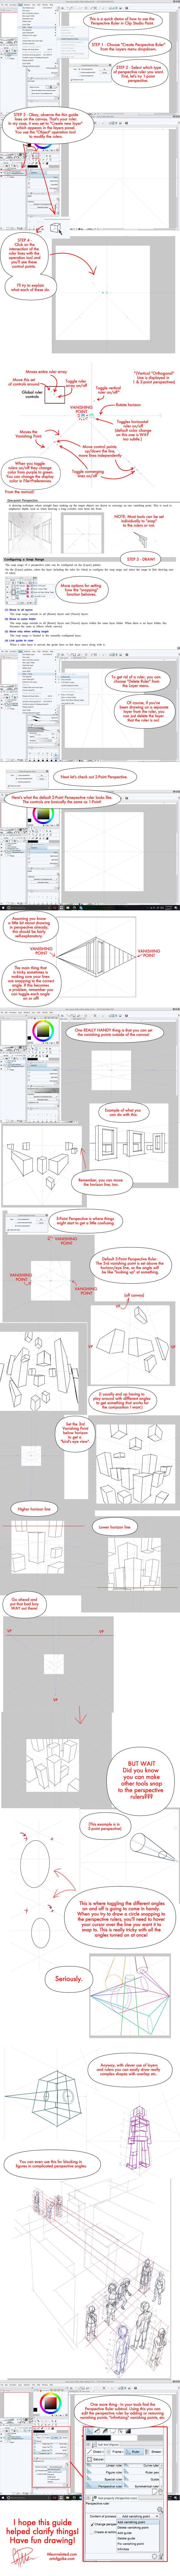 Clip Studio Paint Perspective Ruler Tutorial! by twapa